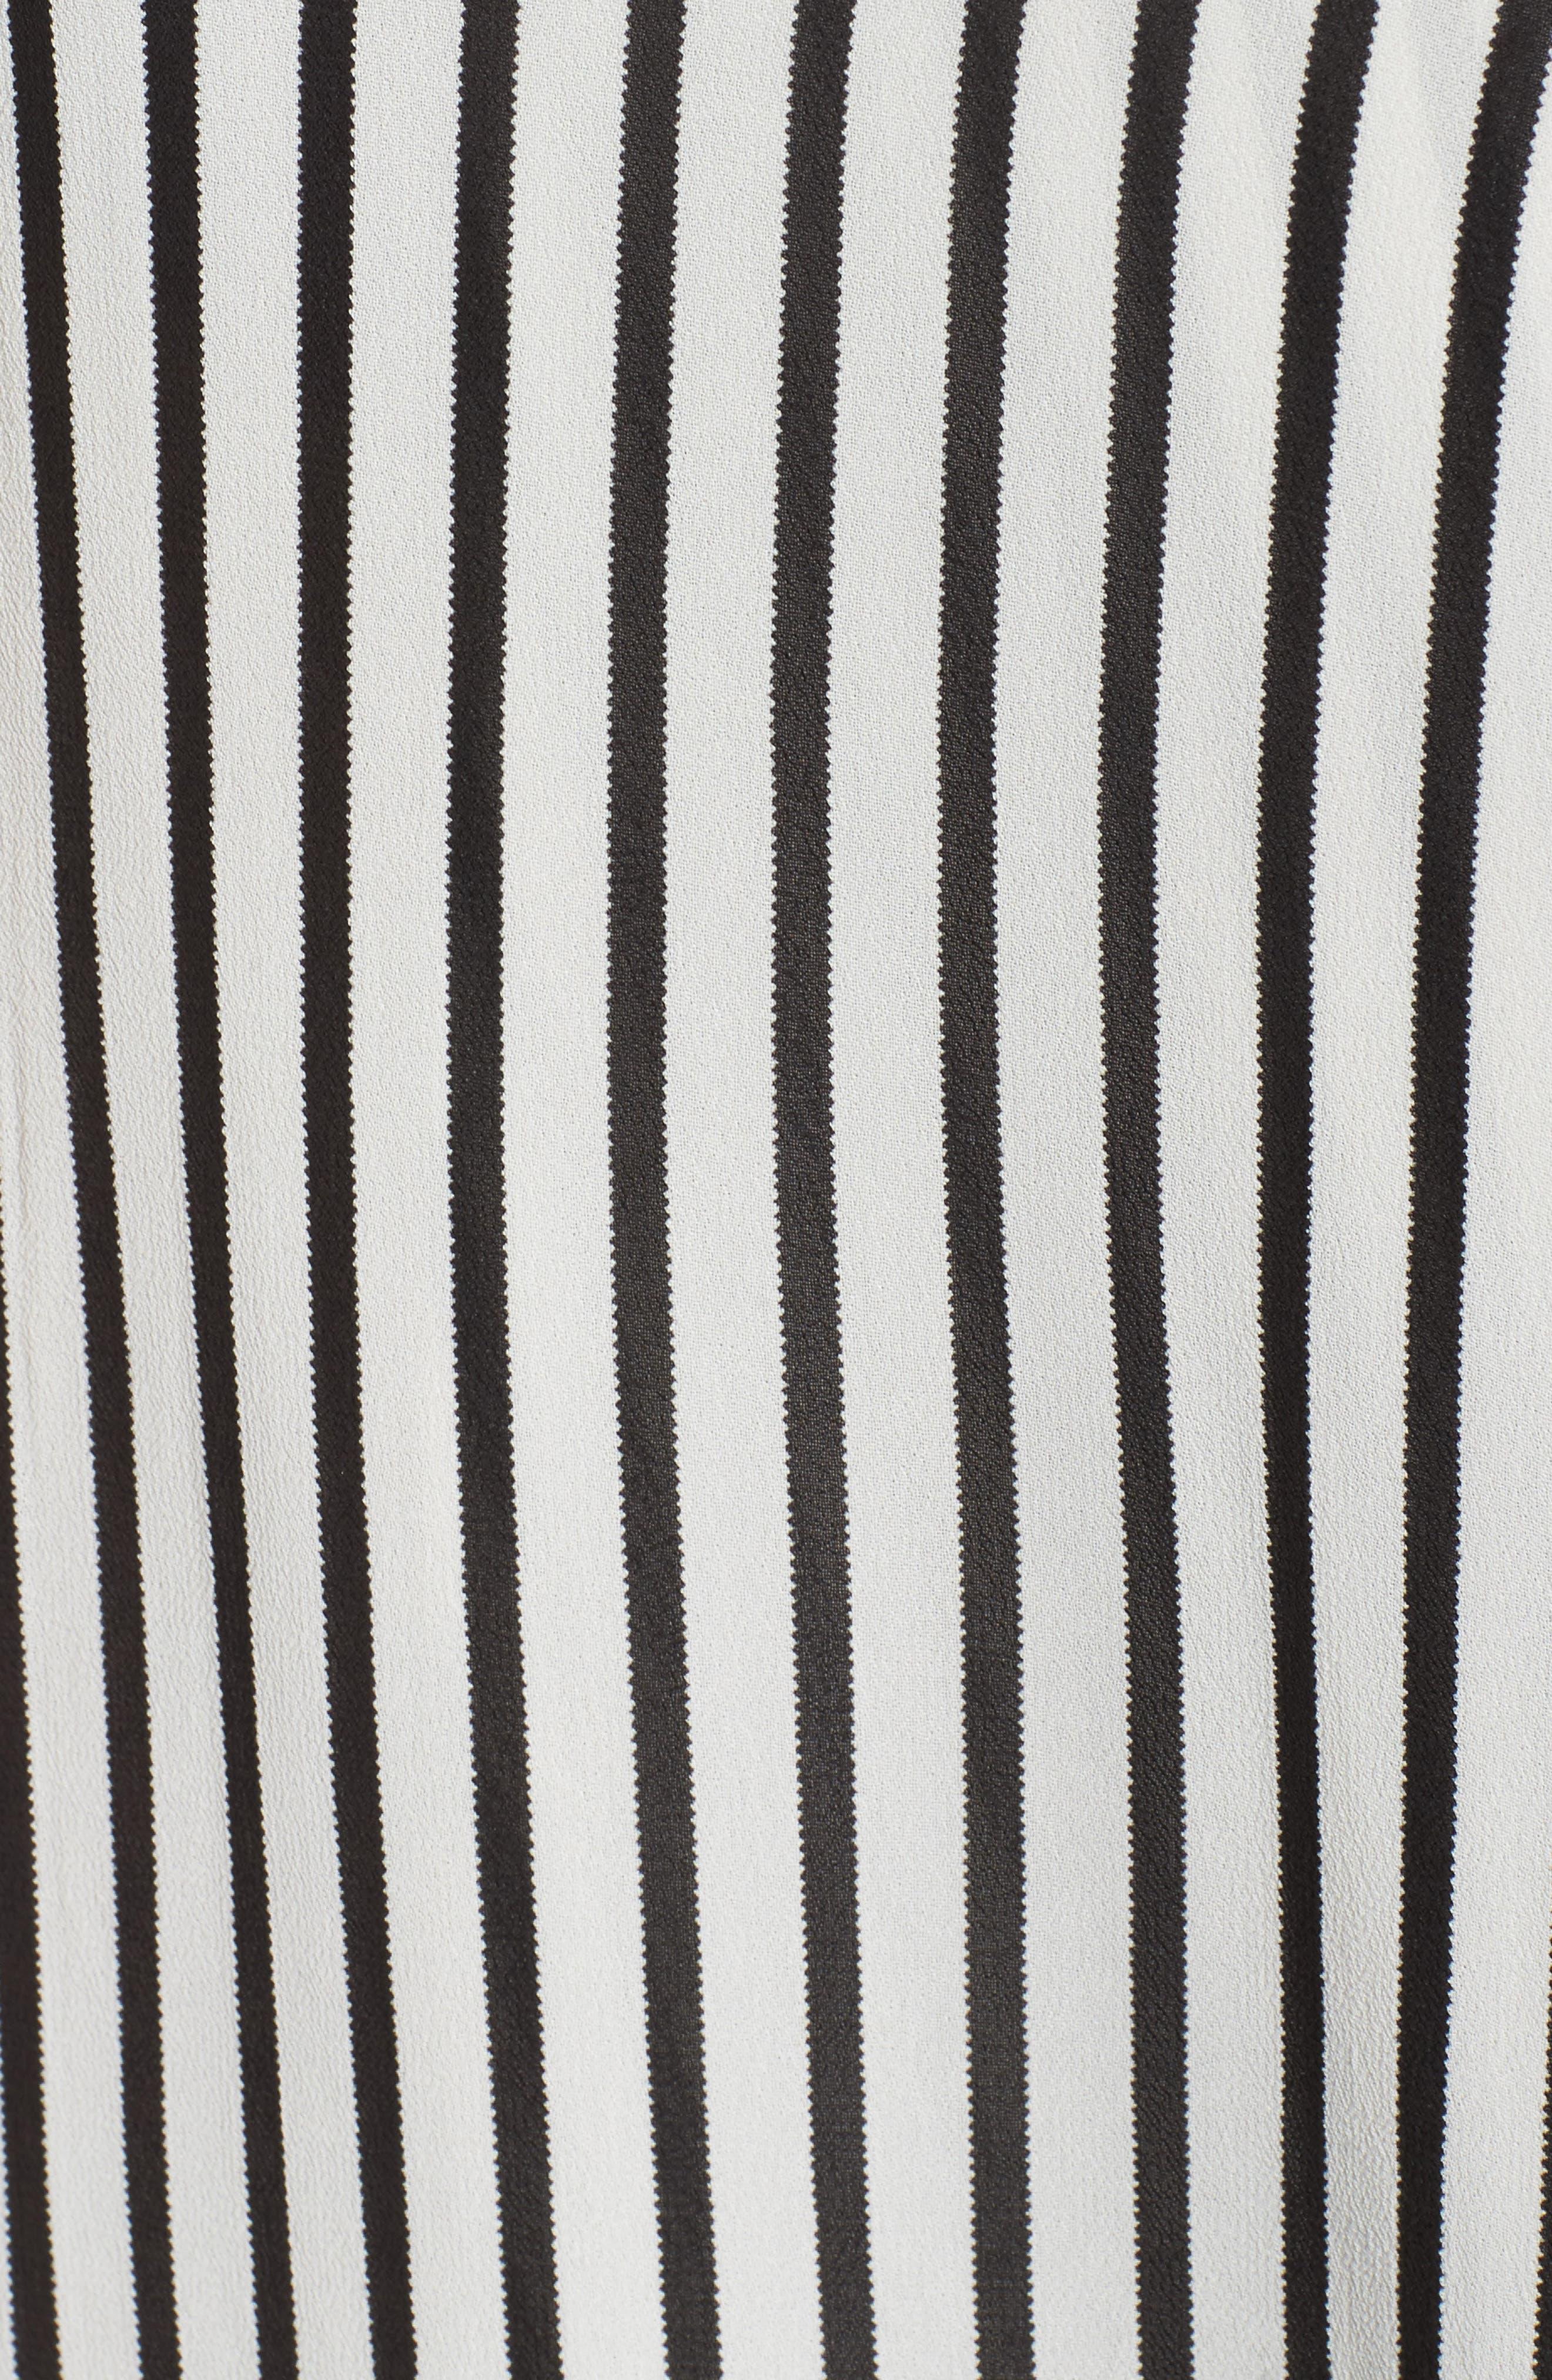 Adie Maxi Wrap Dress,                             Alternate thumbnail 6, color,                             013